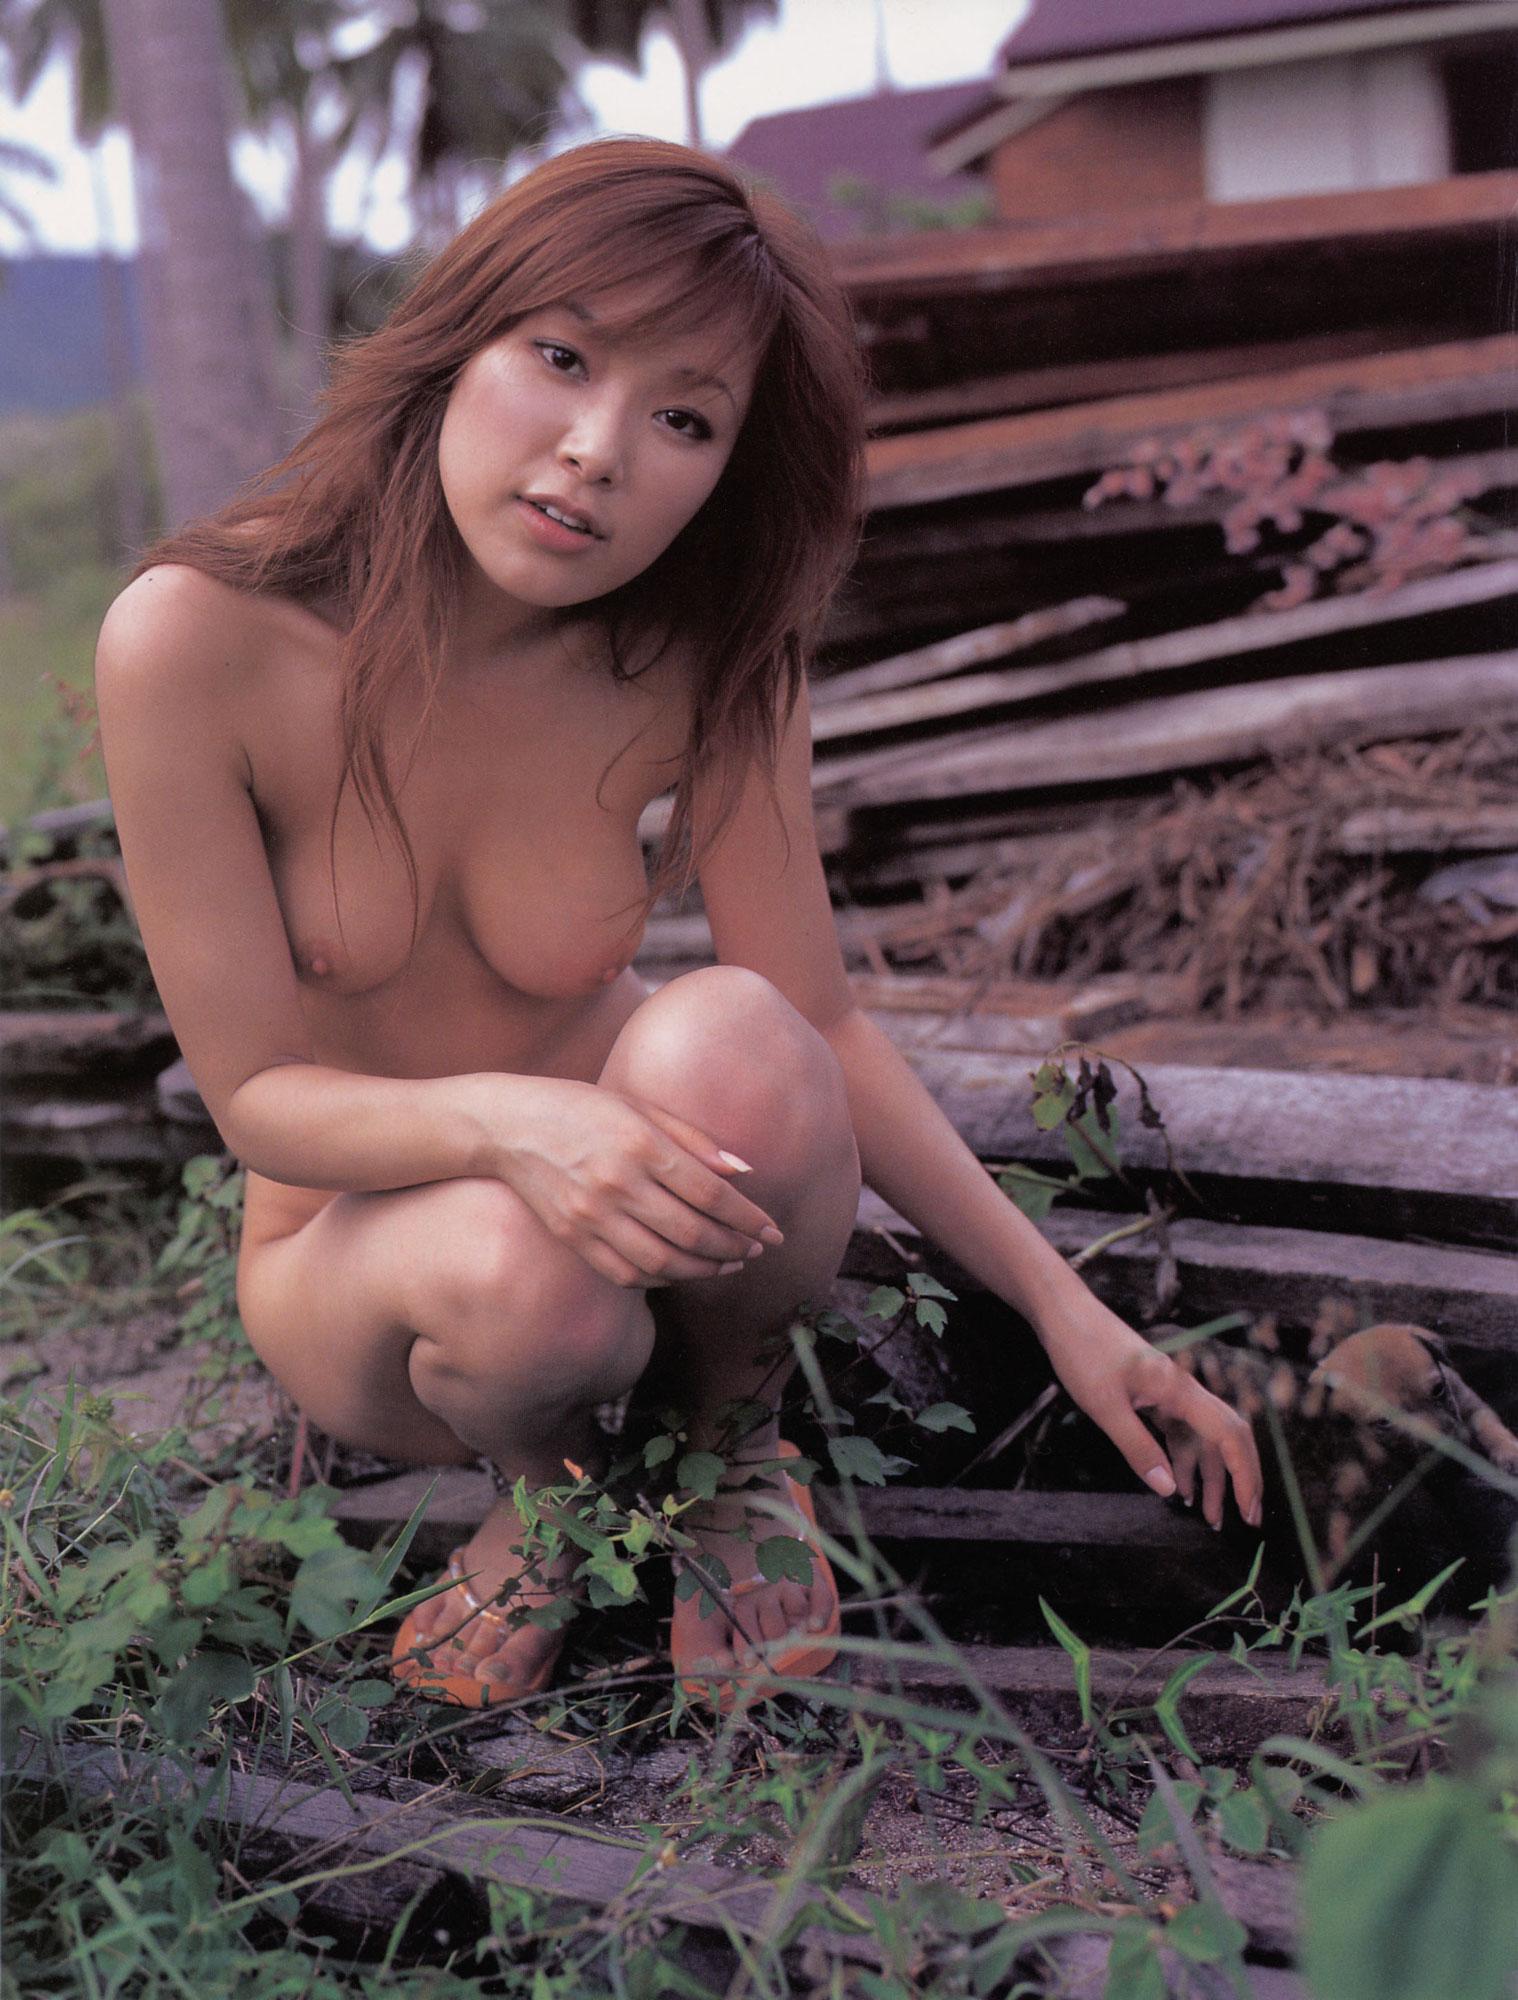 Фото азиатских красавиц ню 16 фотография